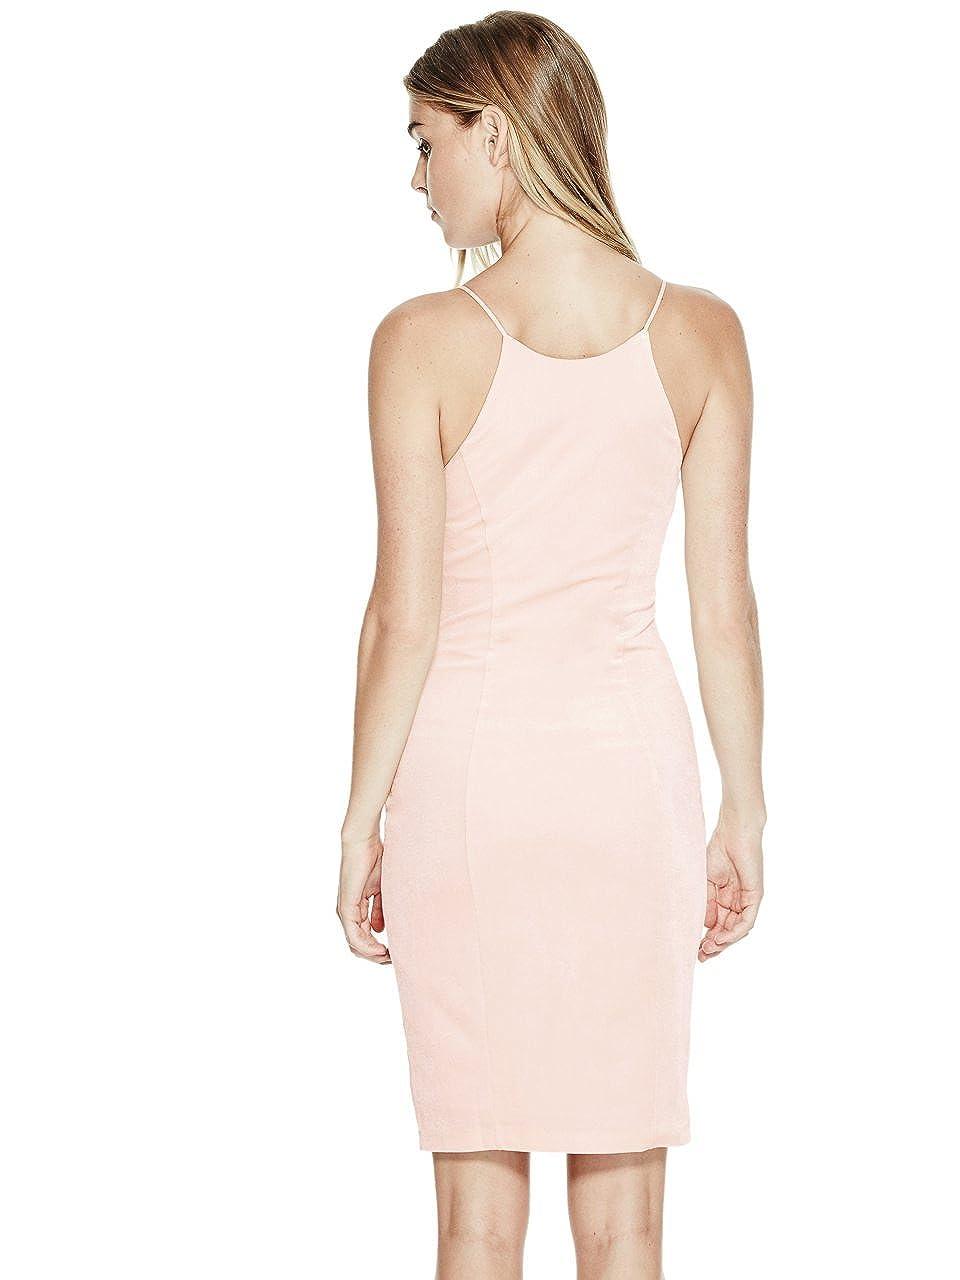 822a24cb GUESS Erika Velvet Sheath Dress Pink Sheer S at Amazon Women's Clothing  store: